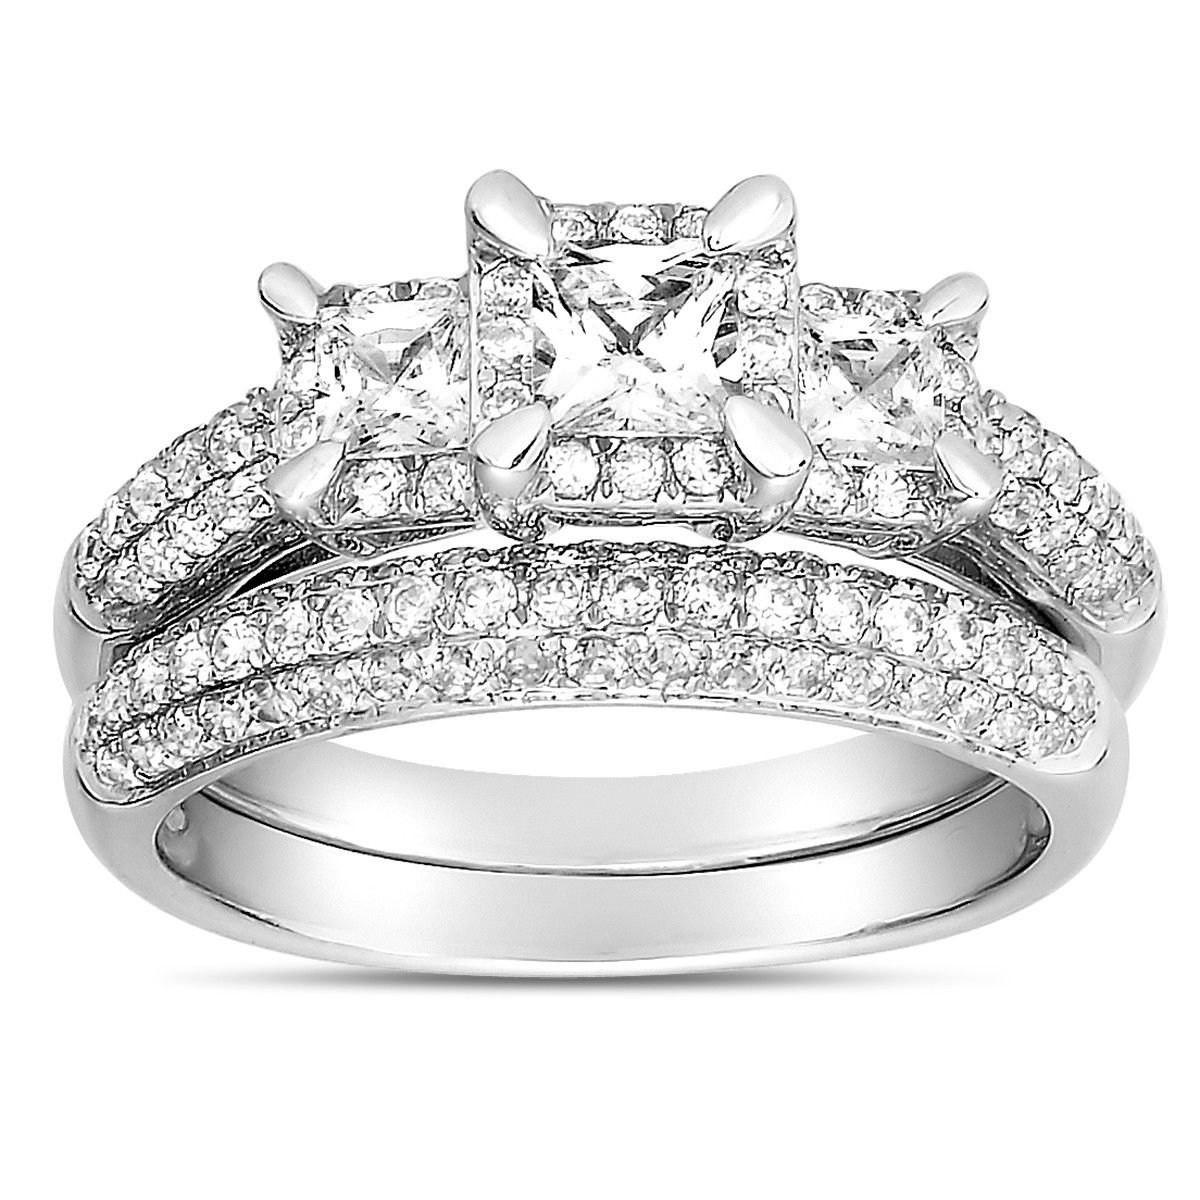 2 Carat Three Stone Trilogy Princess Diamond Wedding Ring Set In White Gold For Women